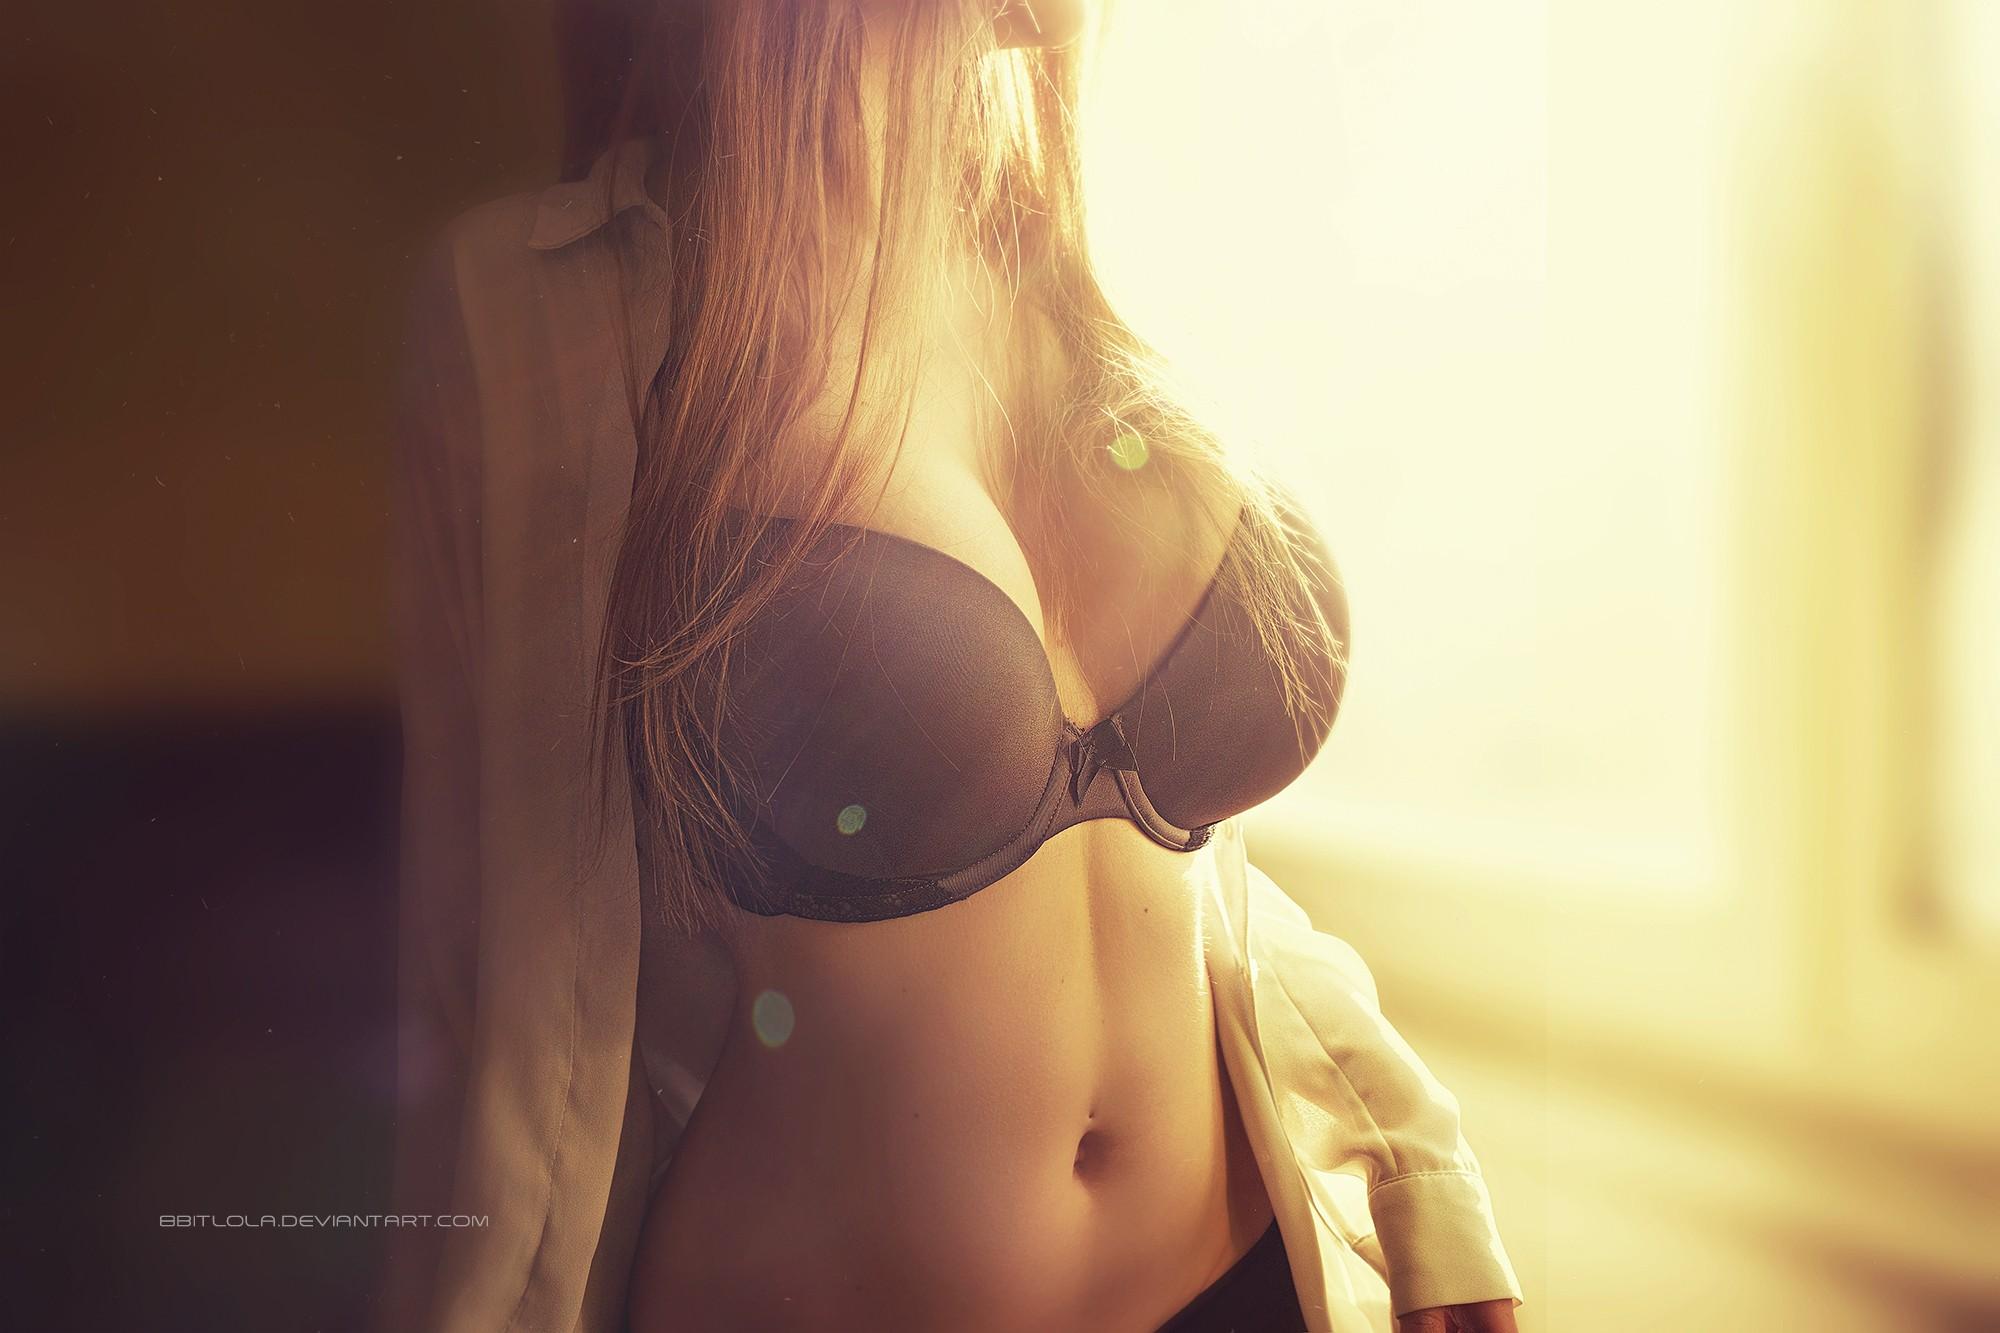 blonde lady in denim dress upskirted